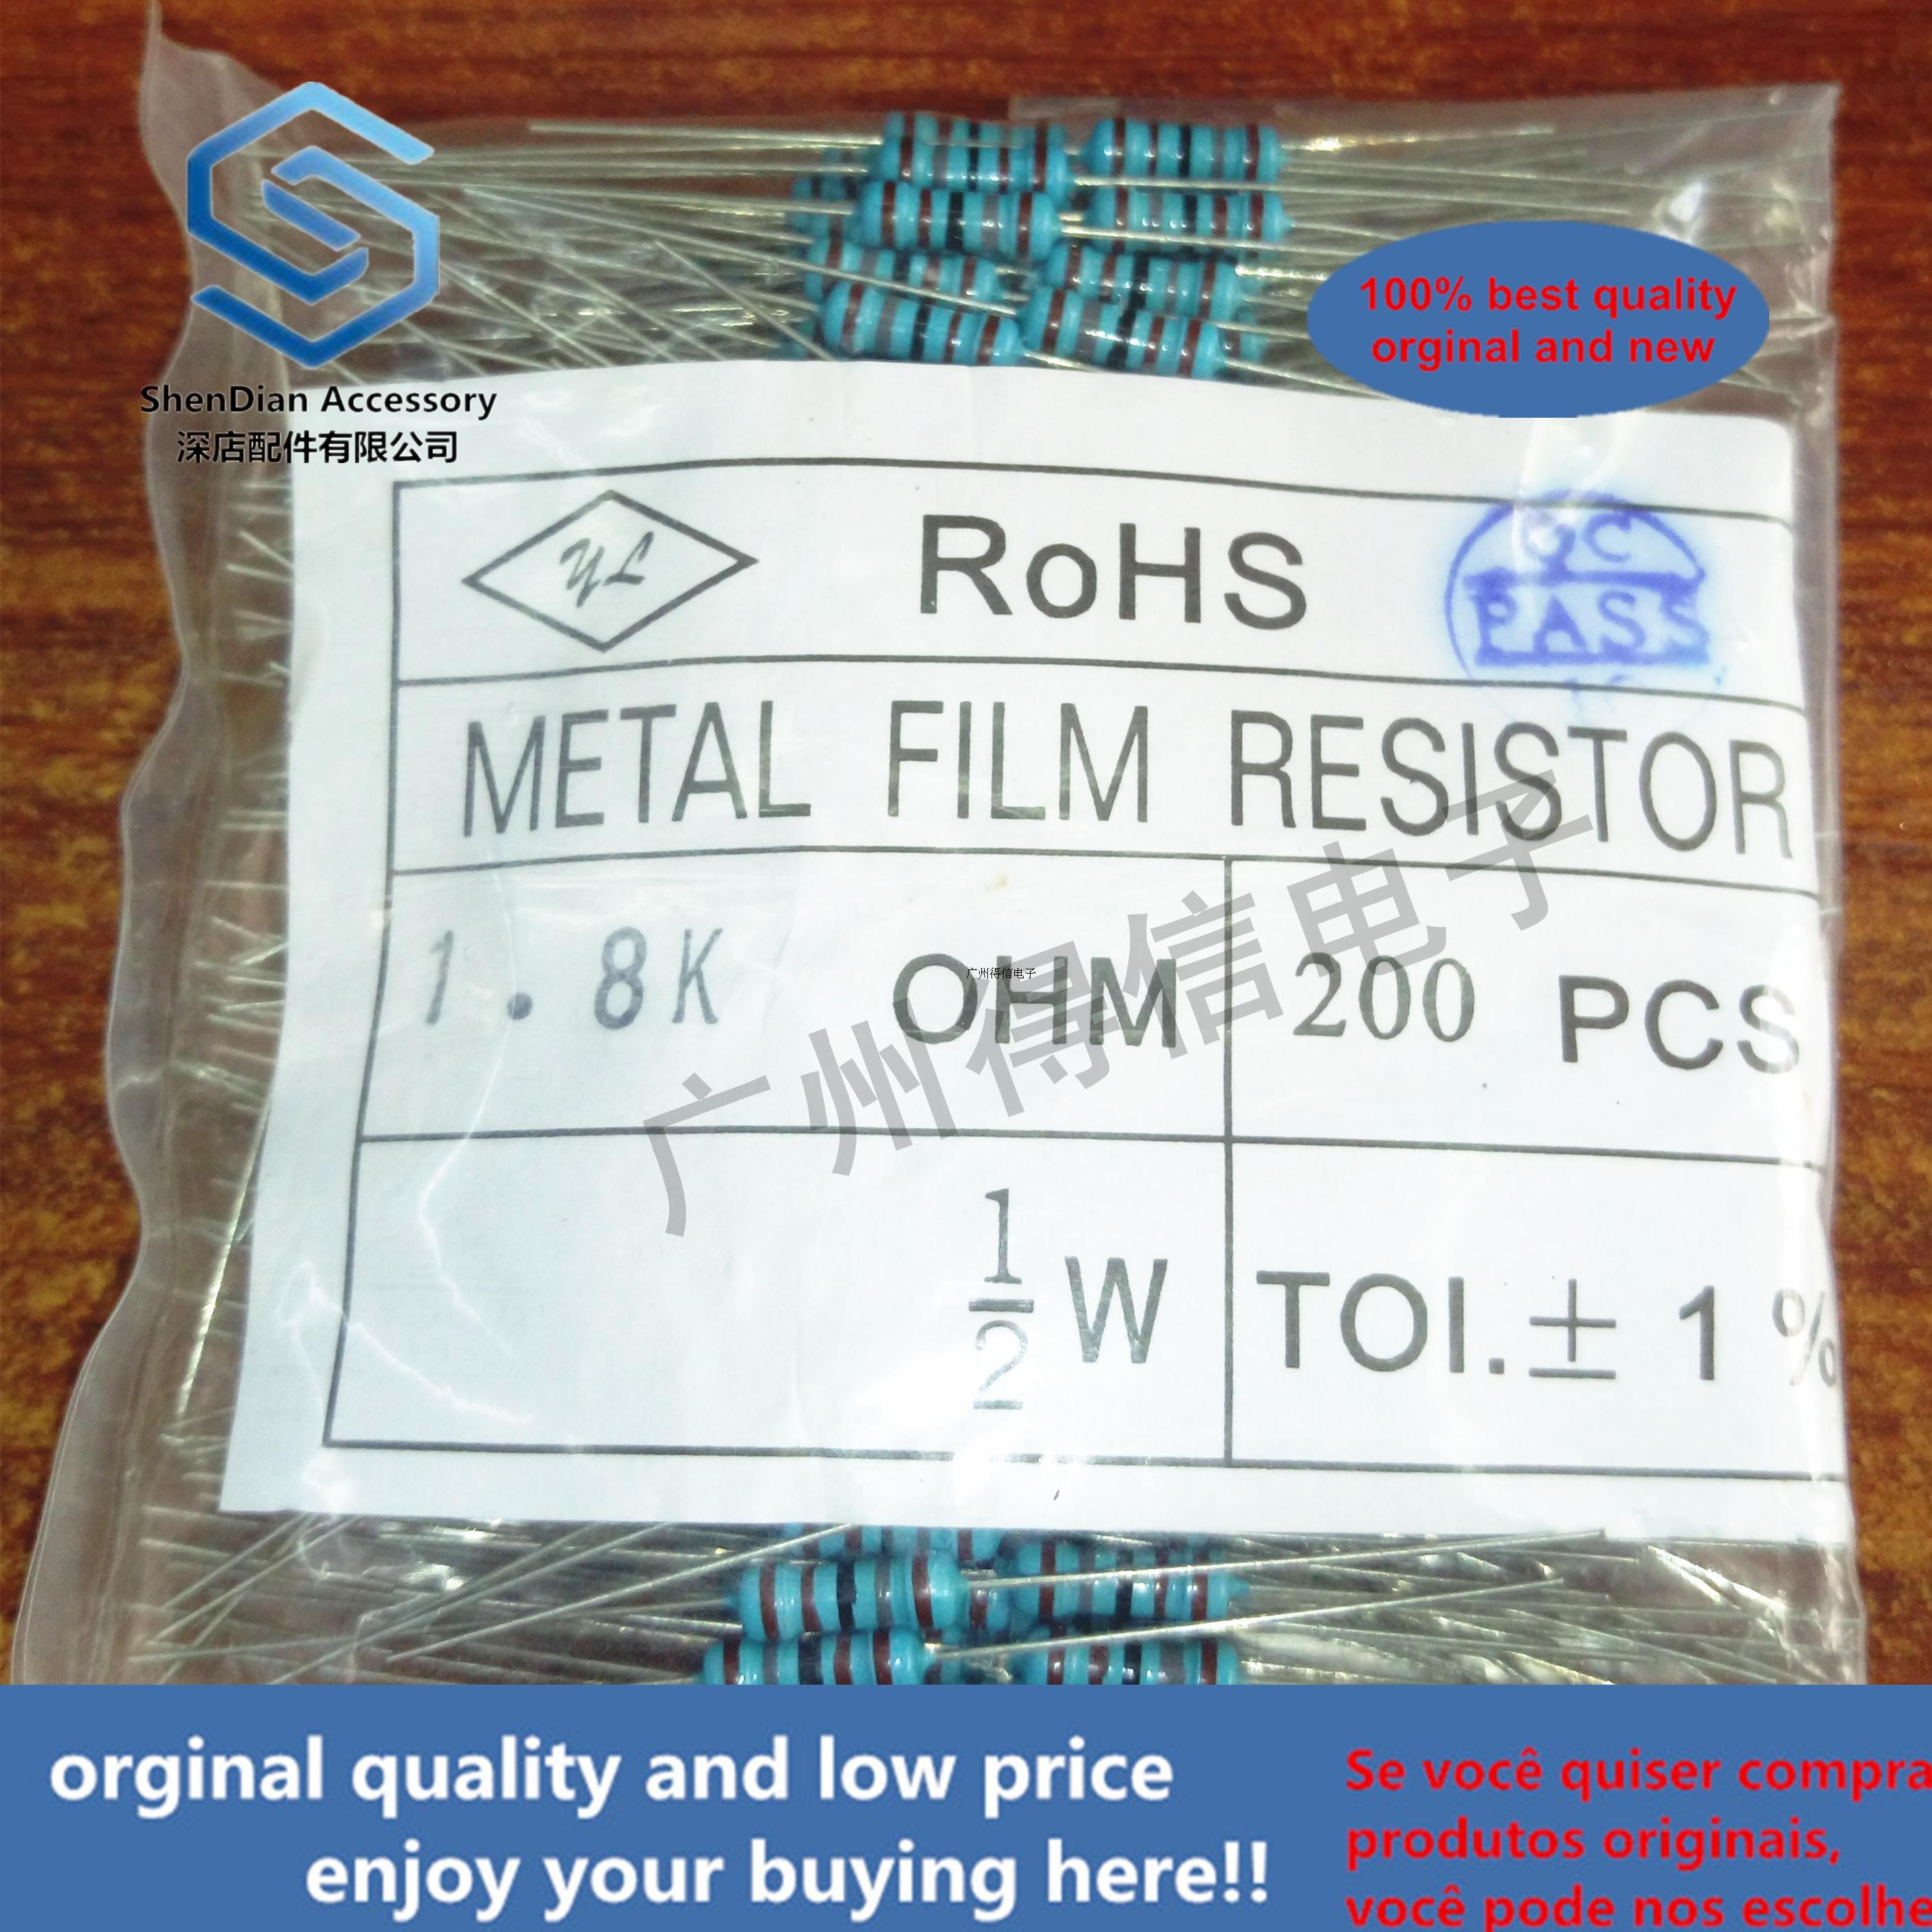 200pcs 1 / 2W 220K 1% Brand New Metal Film Iron Feet Resistance Bag 200 Pcs Per Pack